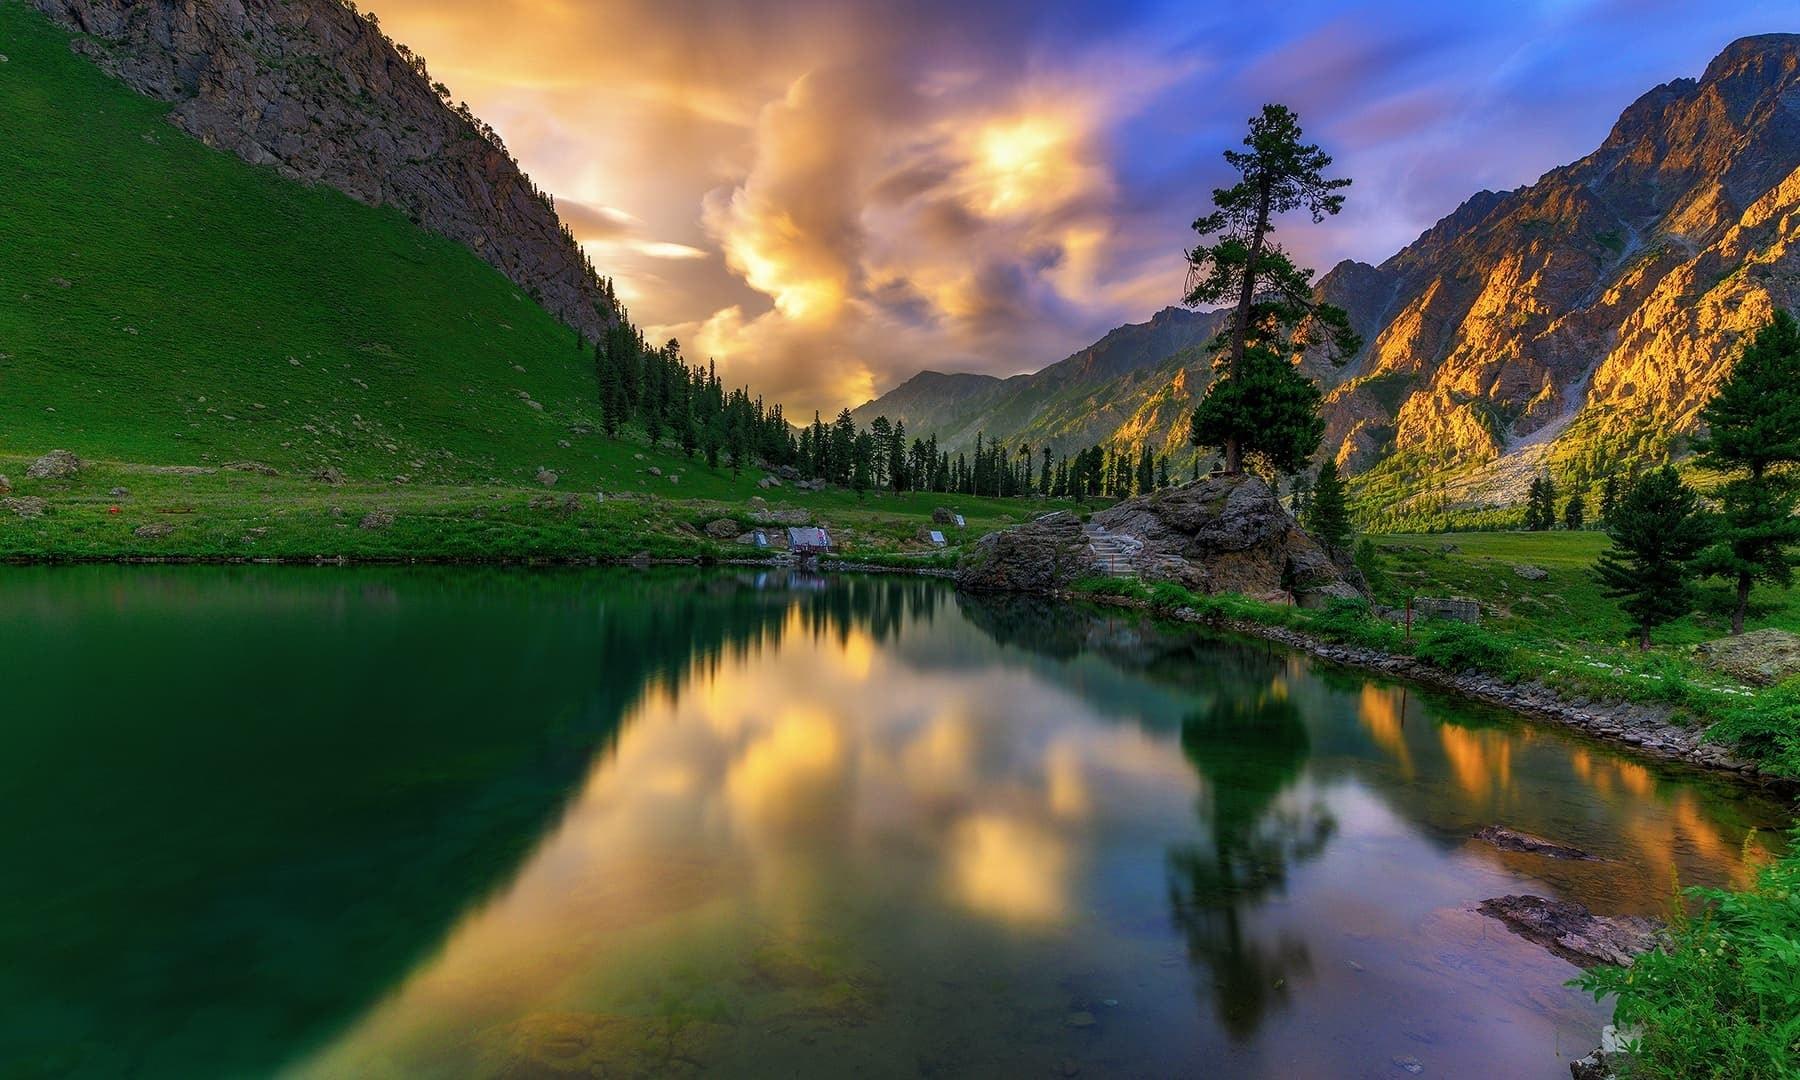 Rainbow lake reflects the beauty of Domel. — Photo by Syed Mehdi Bukhari